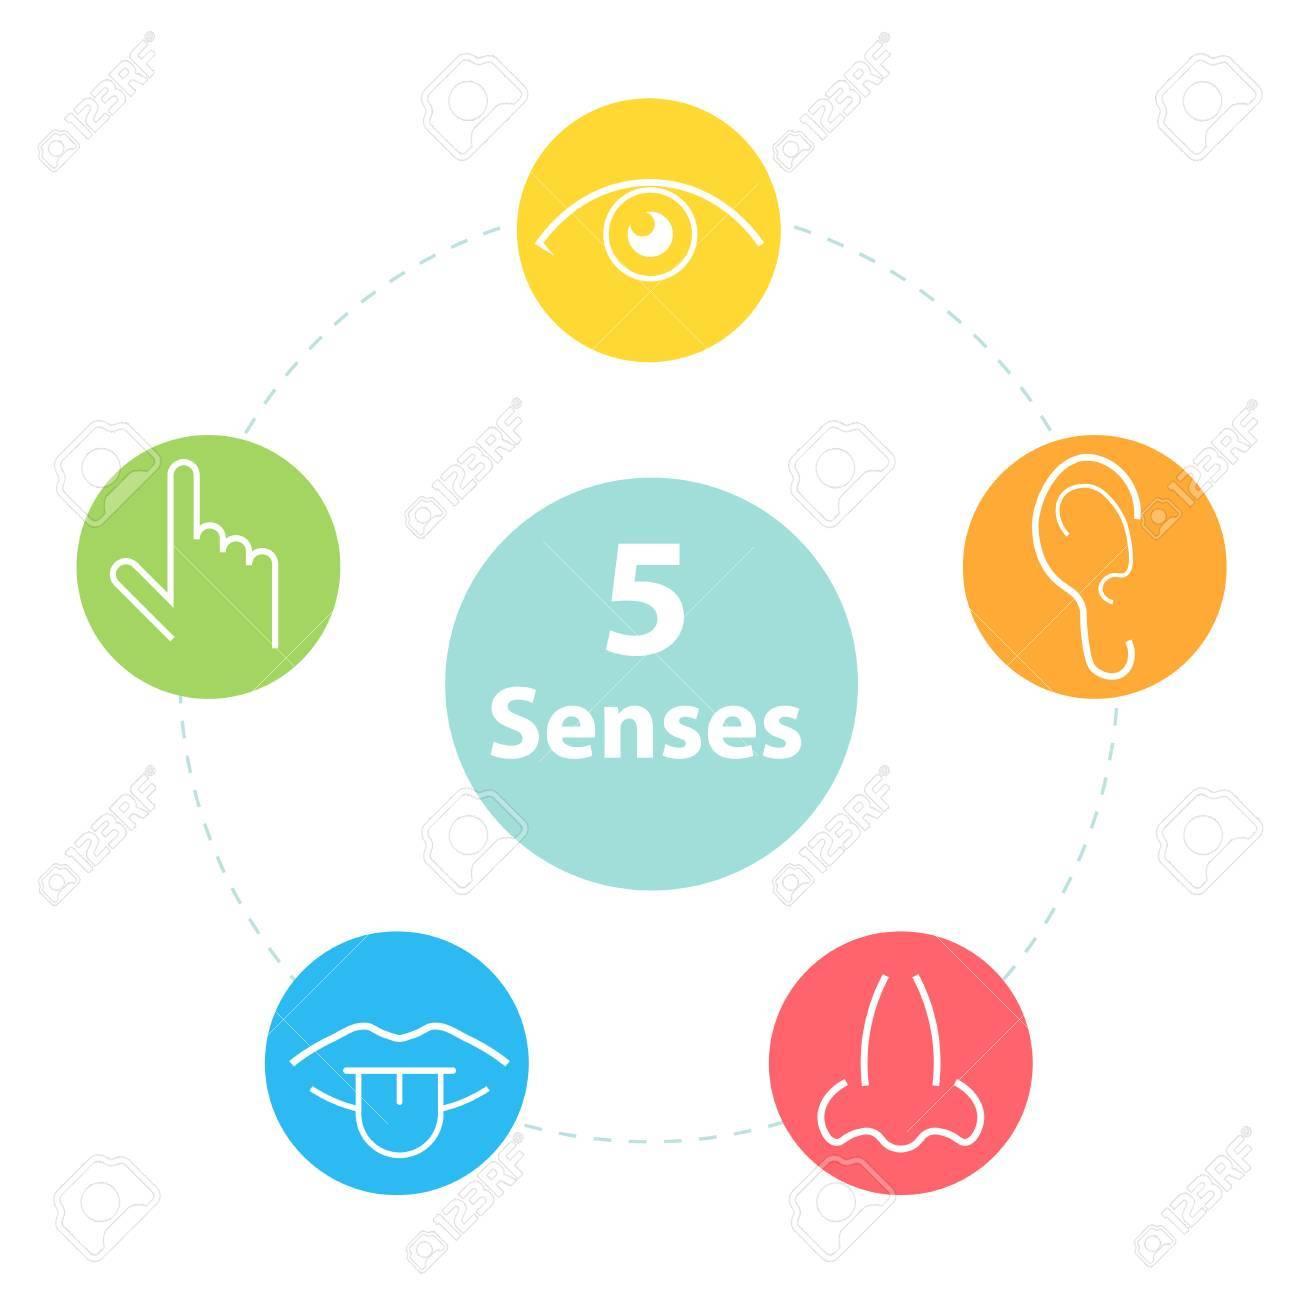 Five senses icons. - 88717979